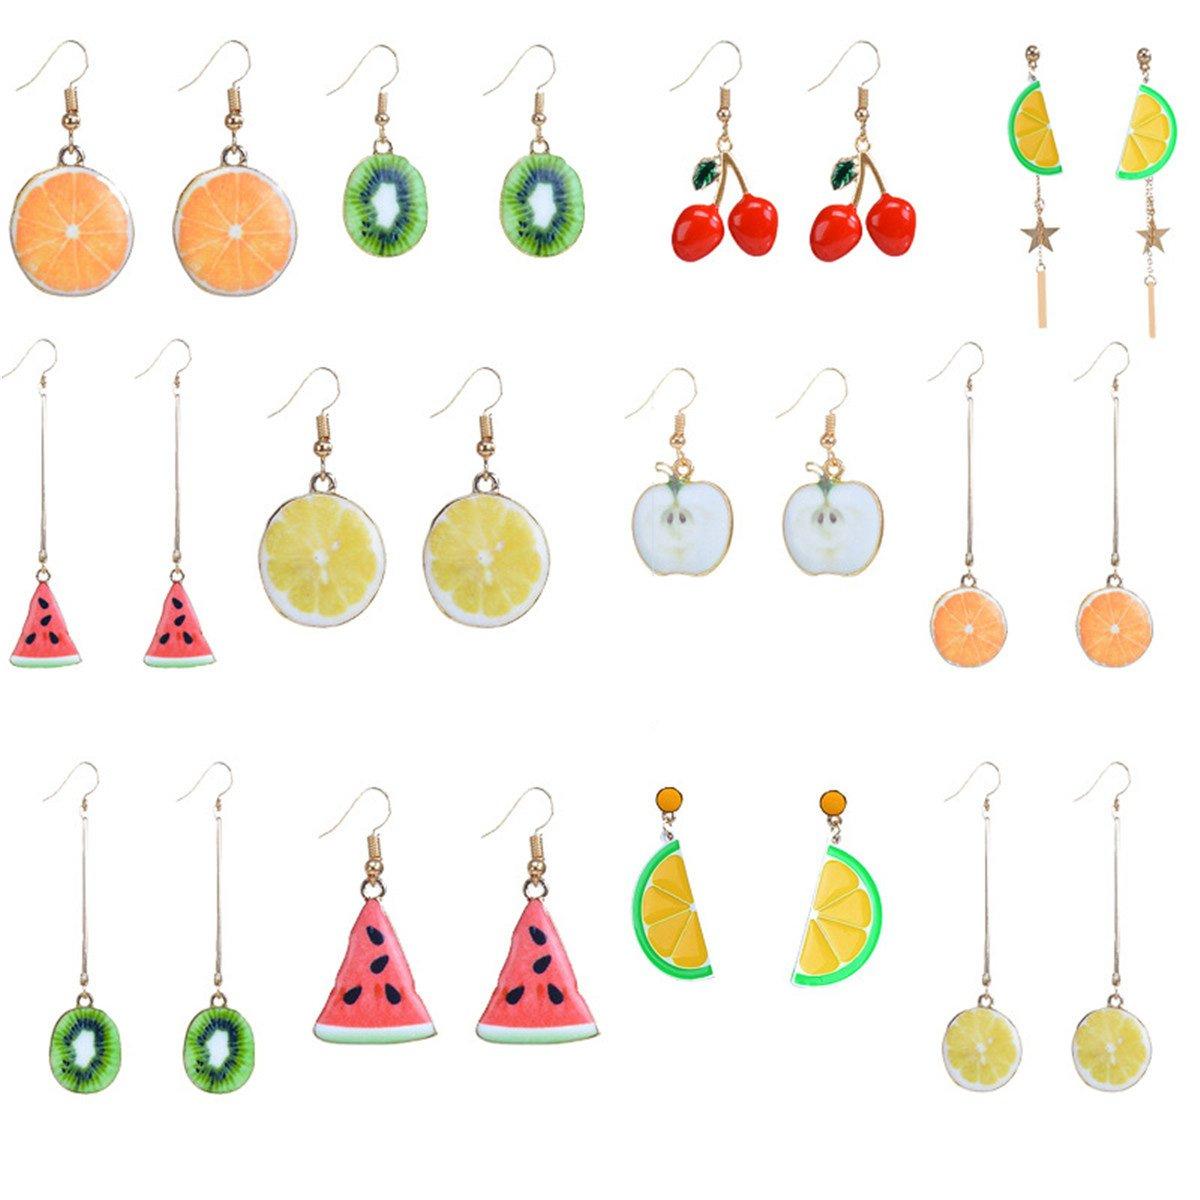 Mrotrida Women's/Girls Summer Fruit Drop Dangle Earrings 12 Pair